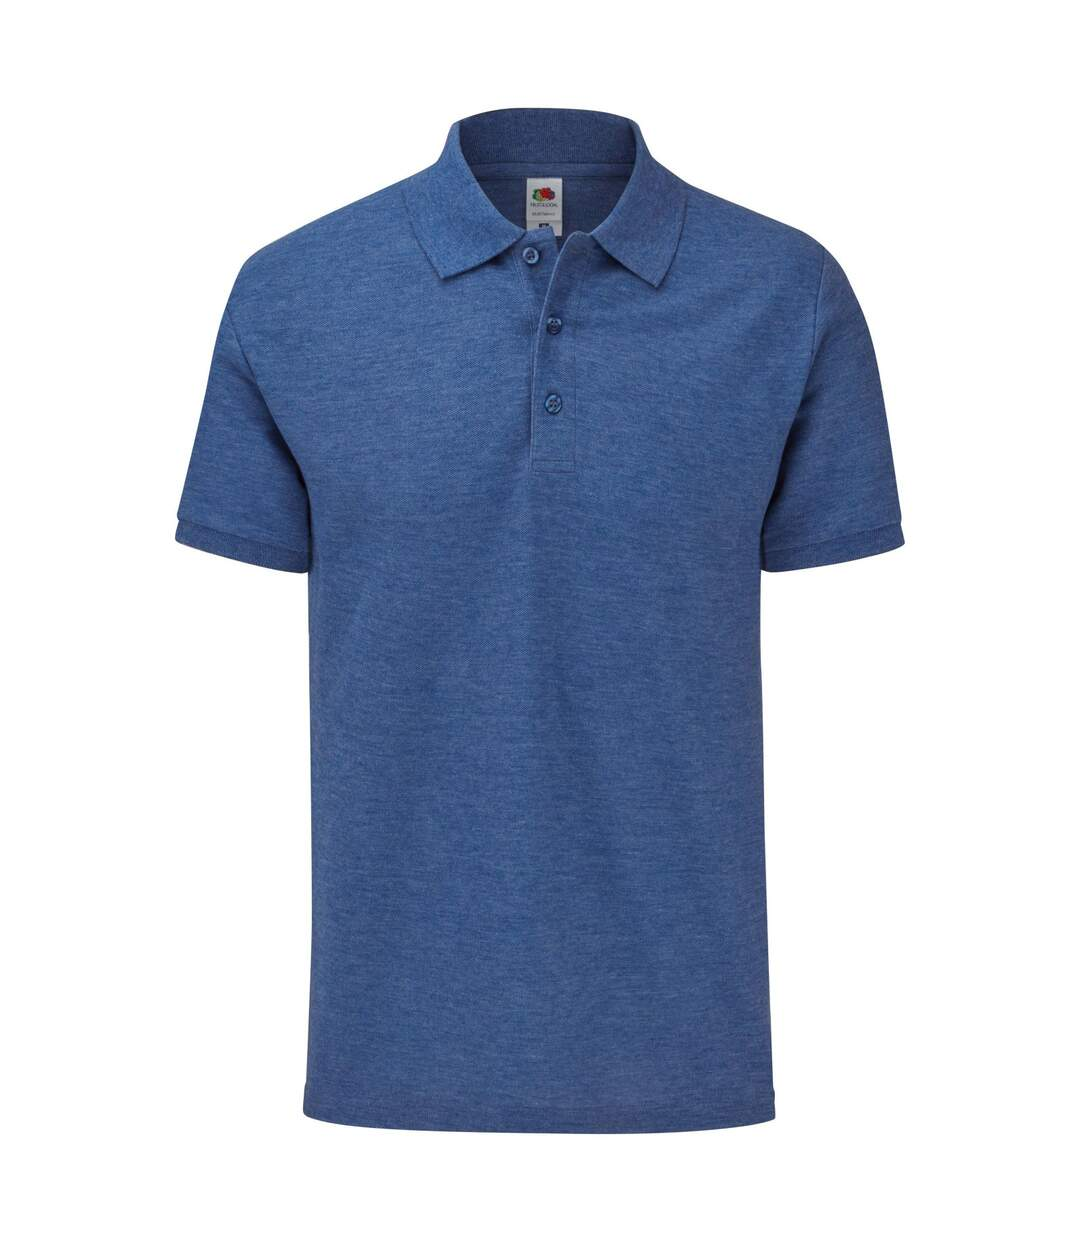 Fruit of the Loom Mens Tailored Polo Shirt (Royal Blue Heather) - UTBC4757